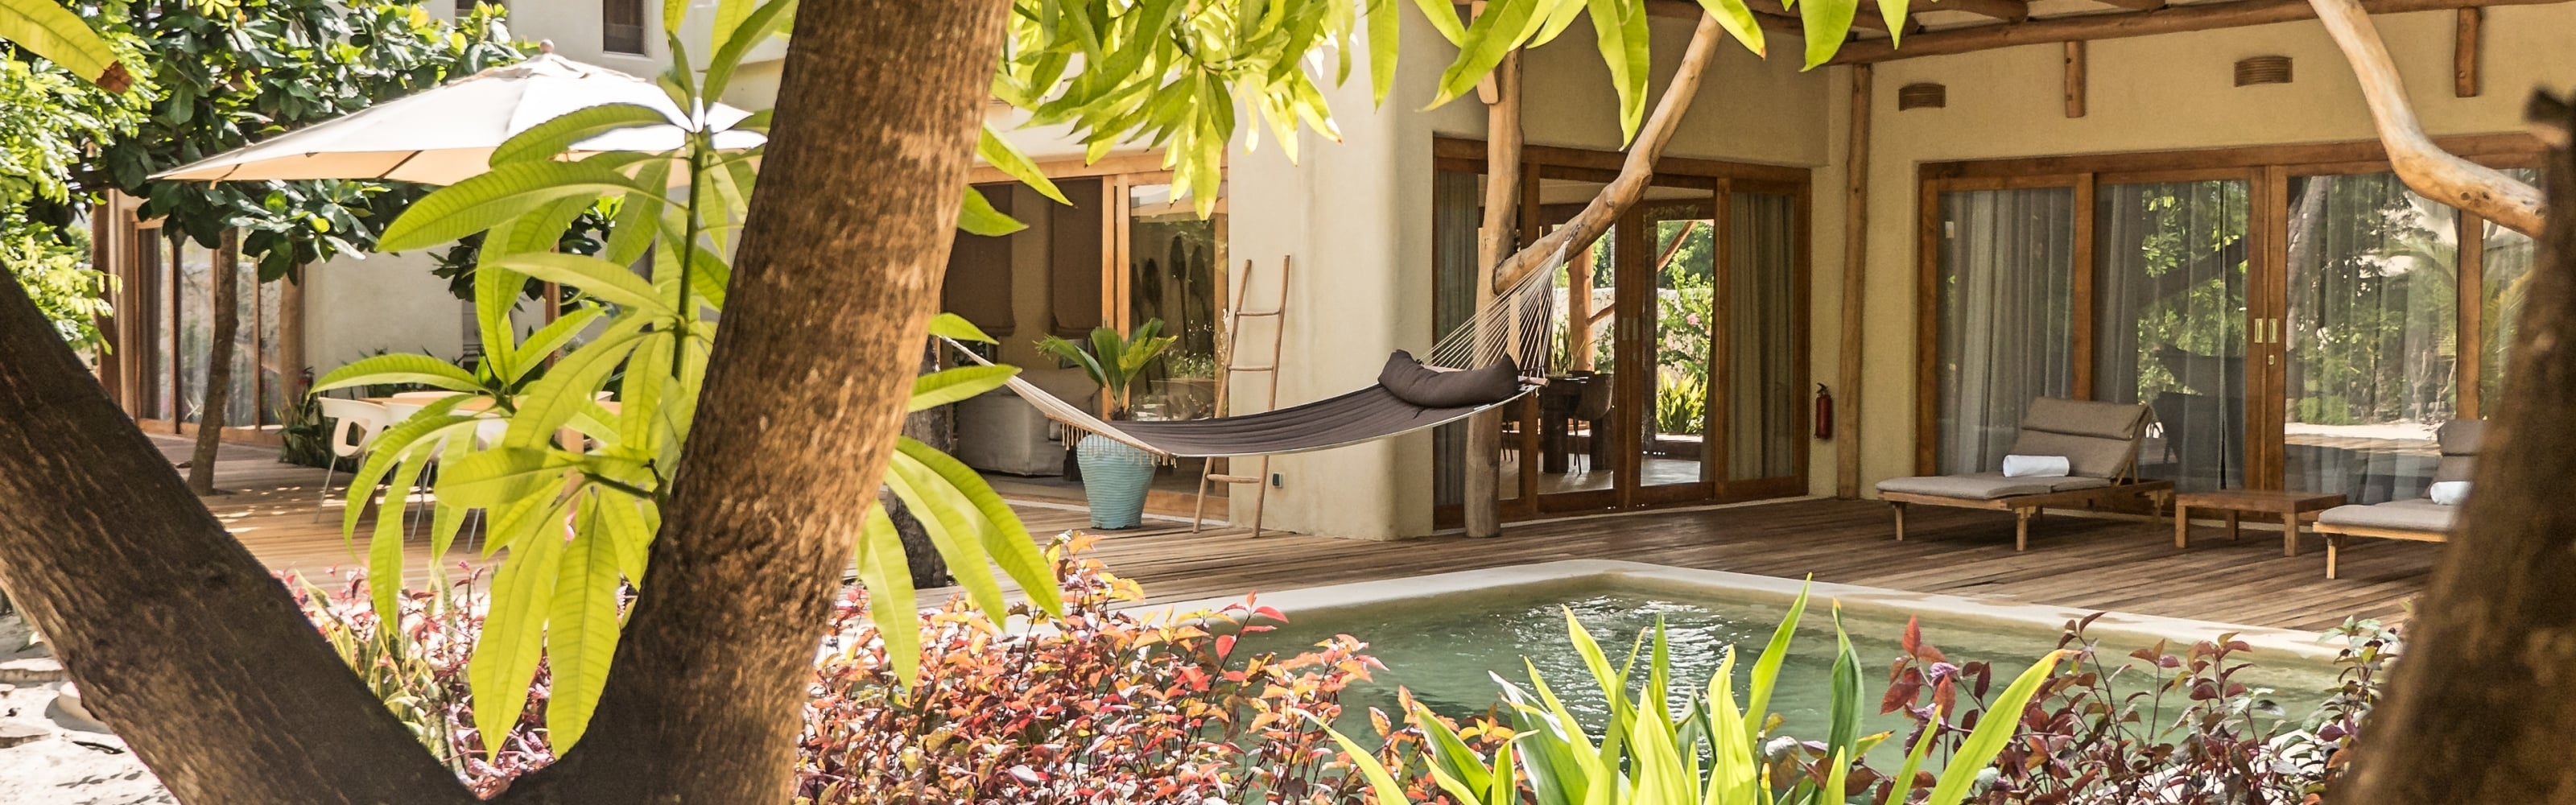 Zanzibar_White_Sand_Luxury_Villas_Deluxe_Room_with_private_pool_Five_bedroom_vila_fivestardestination_five_star_destination_banner